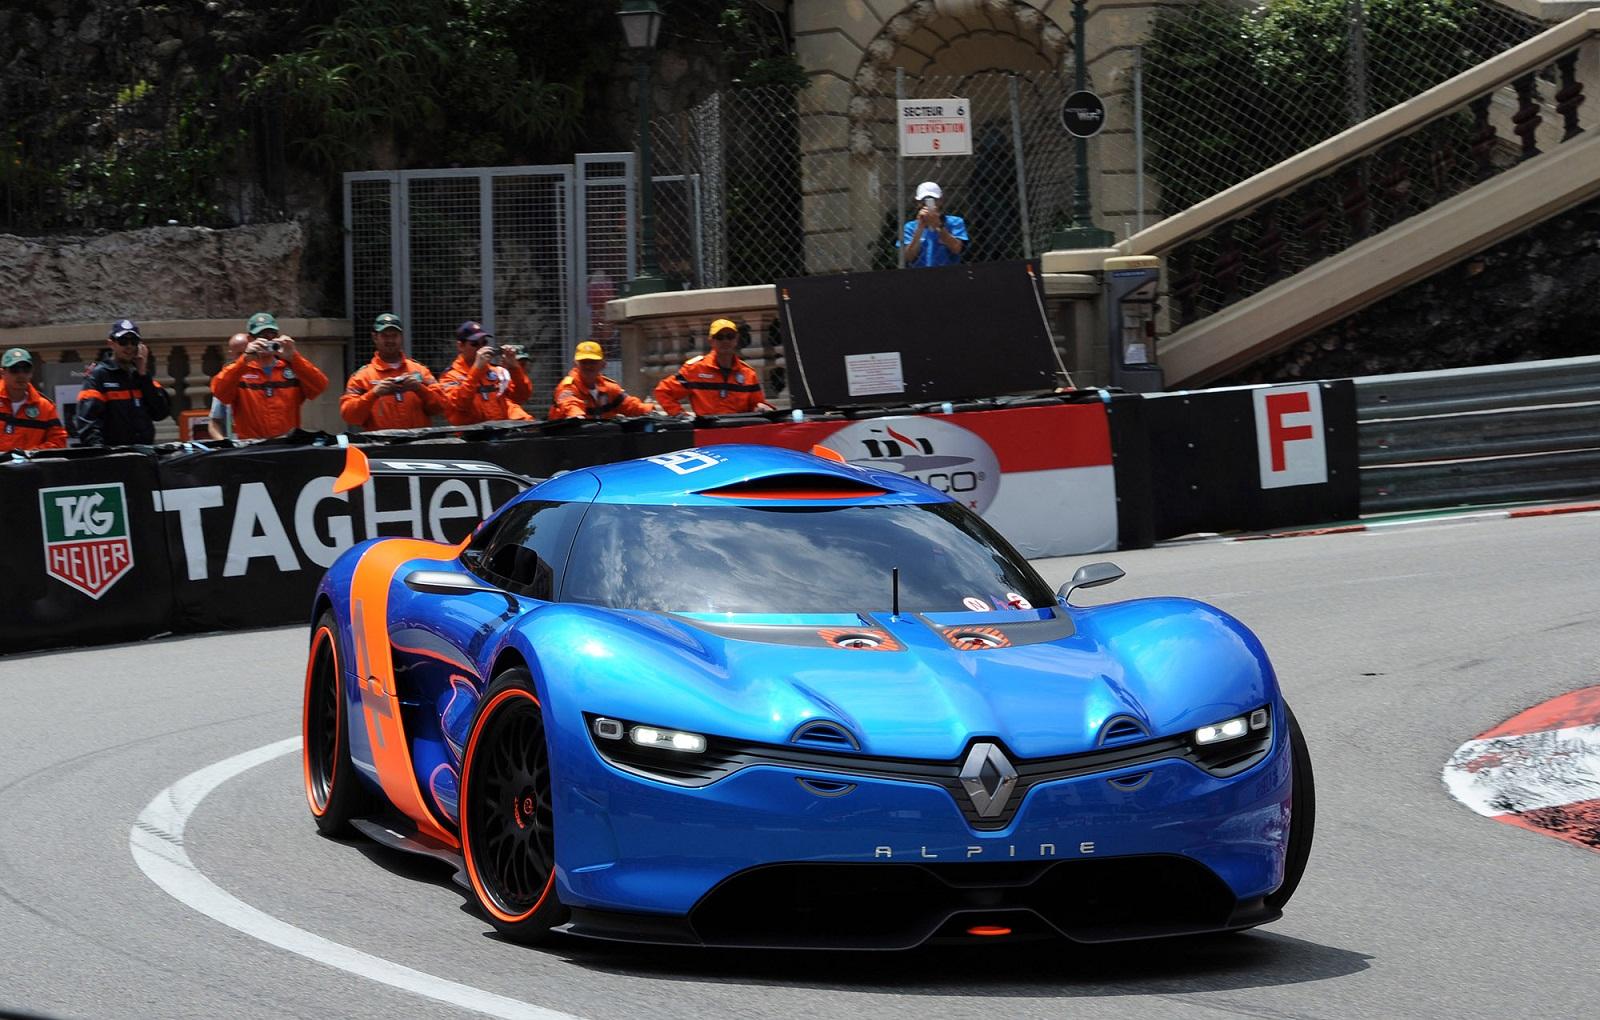 http://1.bp.blogspot.com/-6F2aW5V207k/T8ce_v6u18I/AAAAAAAADoE/0uK2cFU9_v4/s1600/Renault+Alpine+A110-50+supercar+sports+cars+%252821%2529.jpg